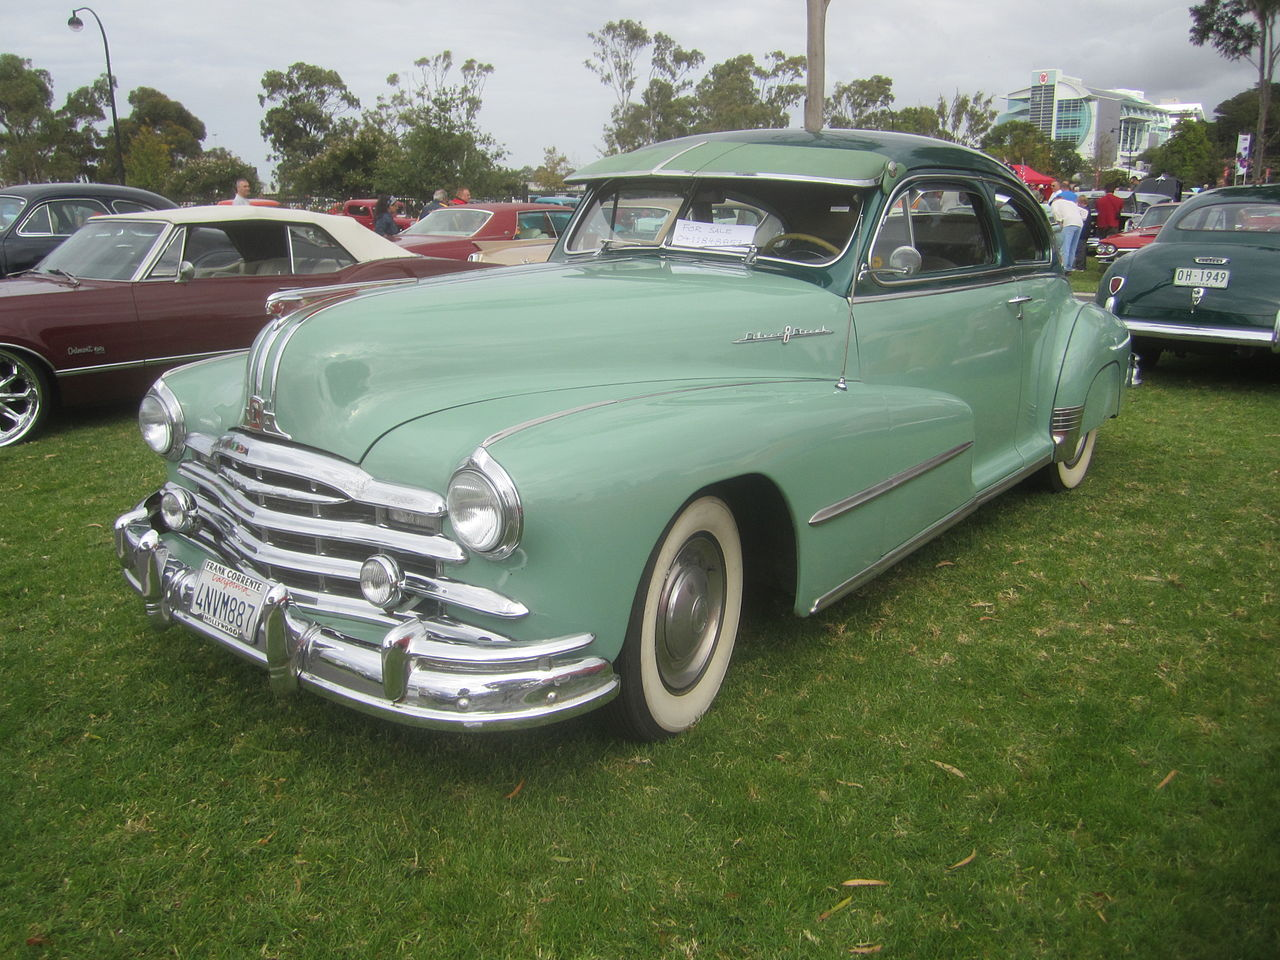 file1948 pontiac streamliner silver streak coupejpg wikimedia